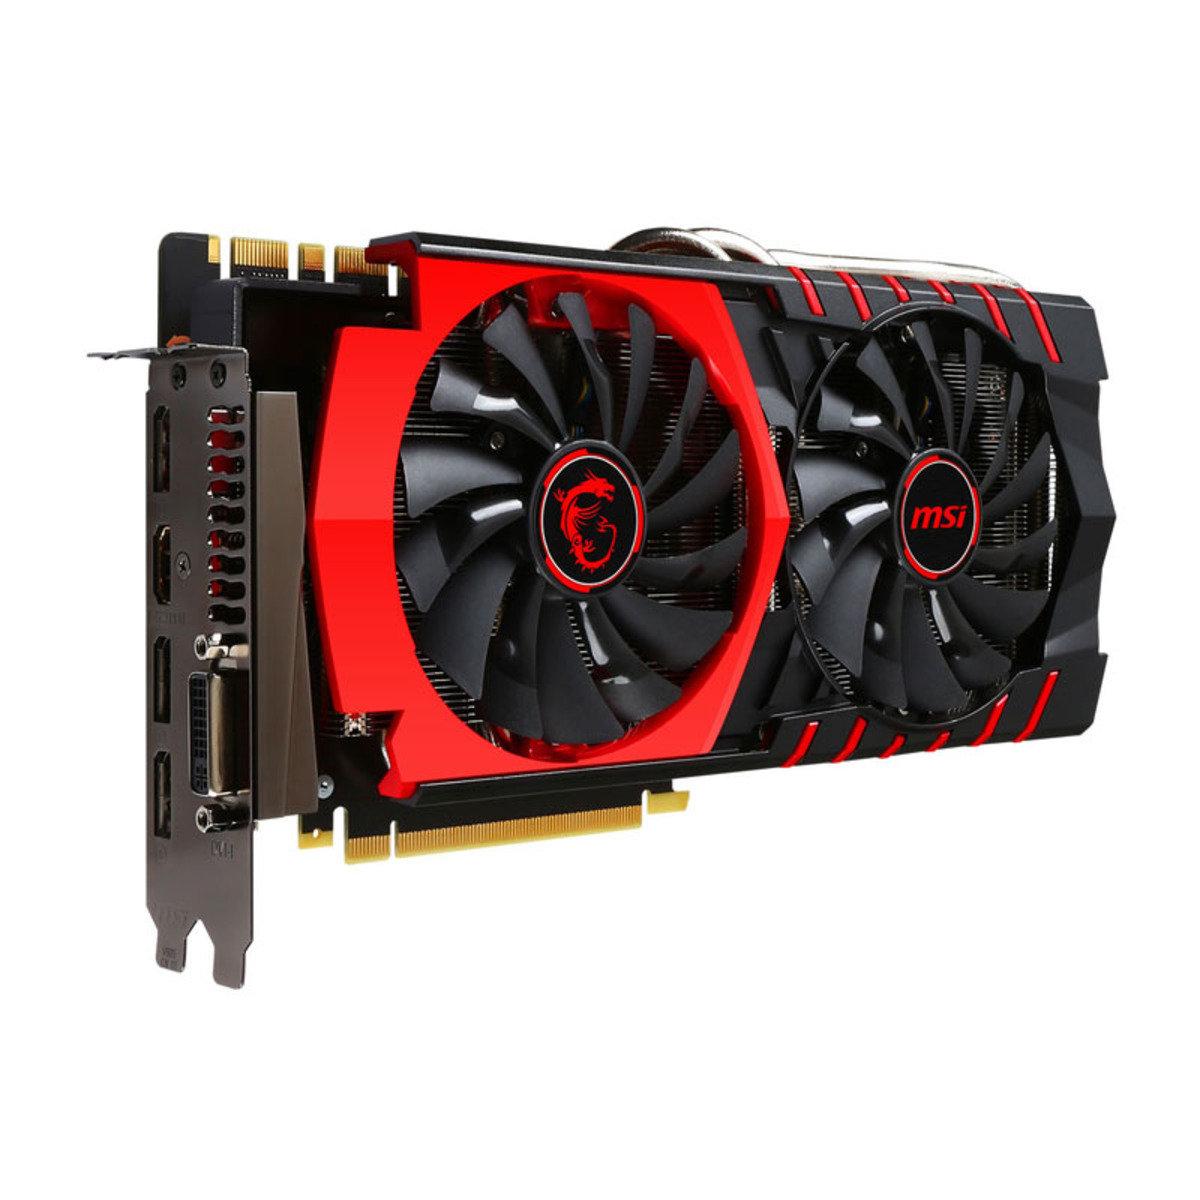 GTX980Ti 6GB GDDR5 PCI-E 頂級效能獨立顯示卡 GTX 980TI GAMING 6G